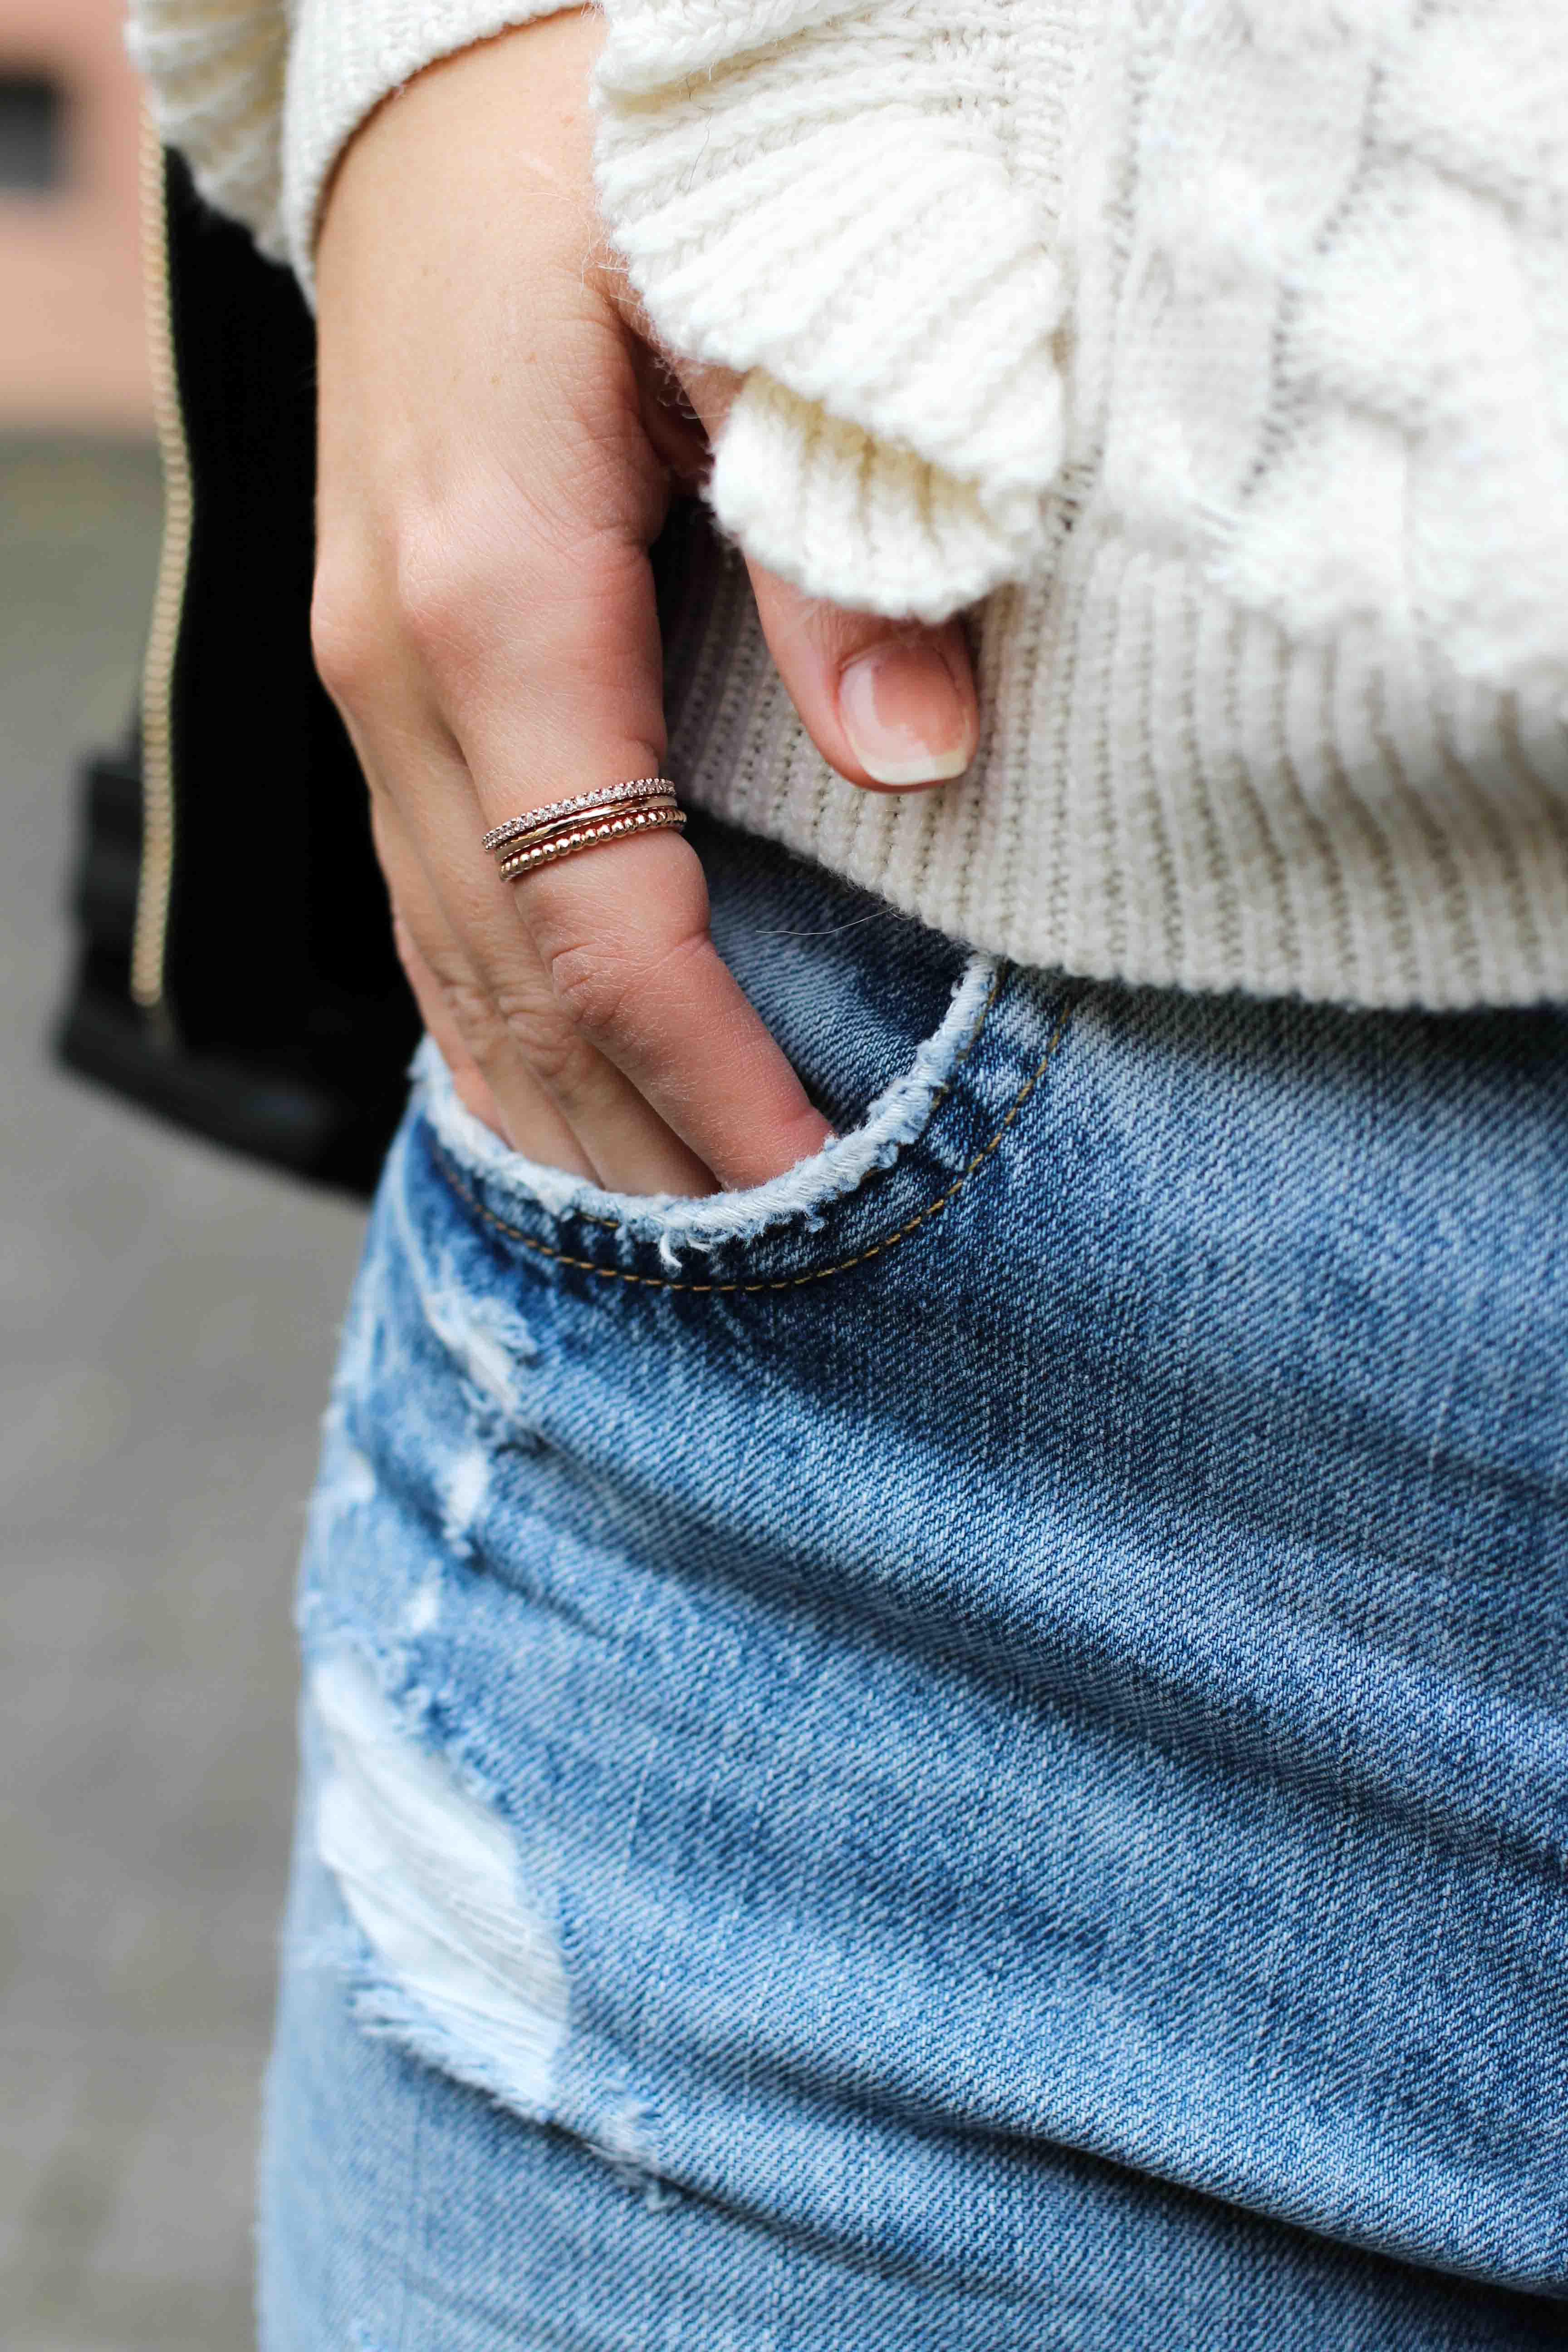 Thomas Sabo rosegold ringe filigran rosegoldener Schmuck Accessoires Modeblog kombinieren